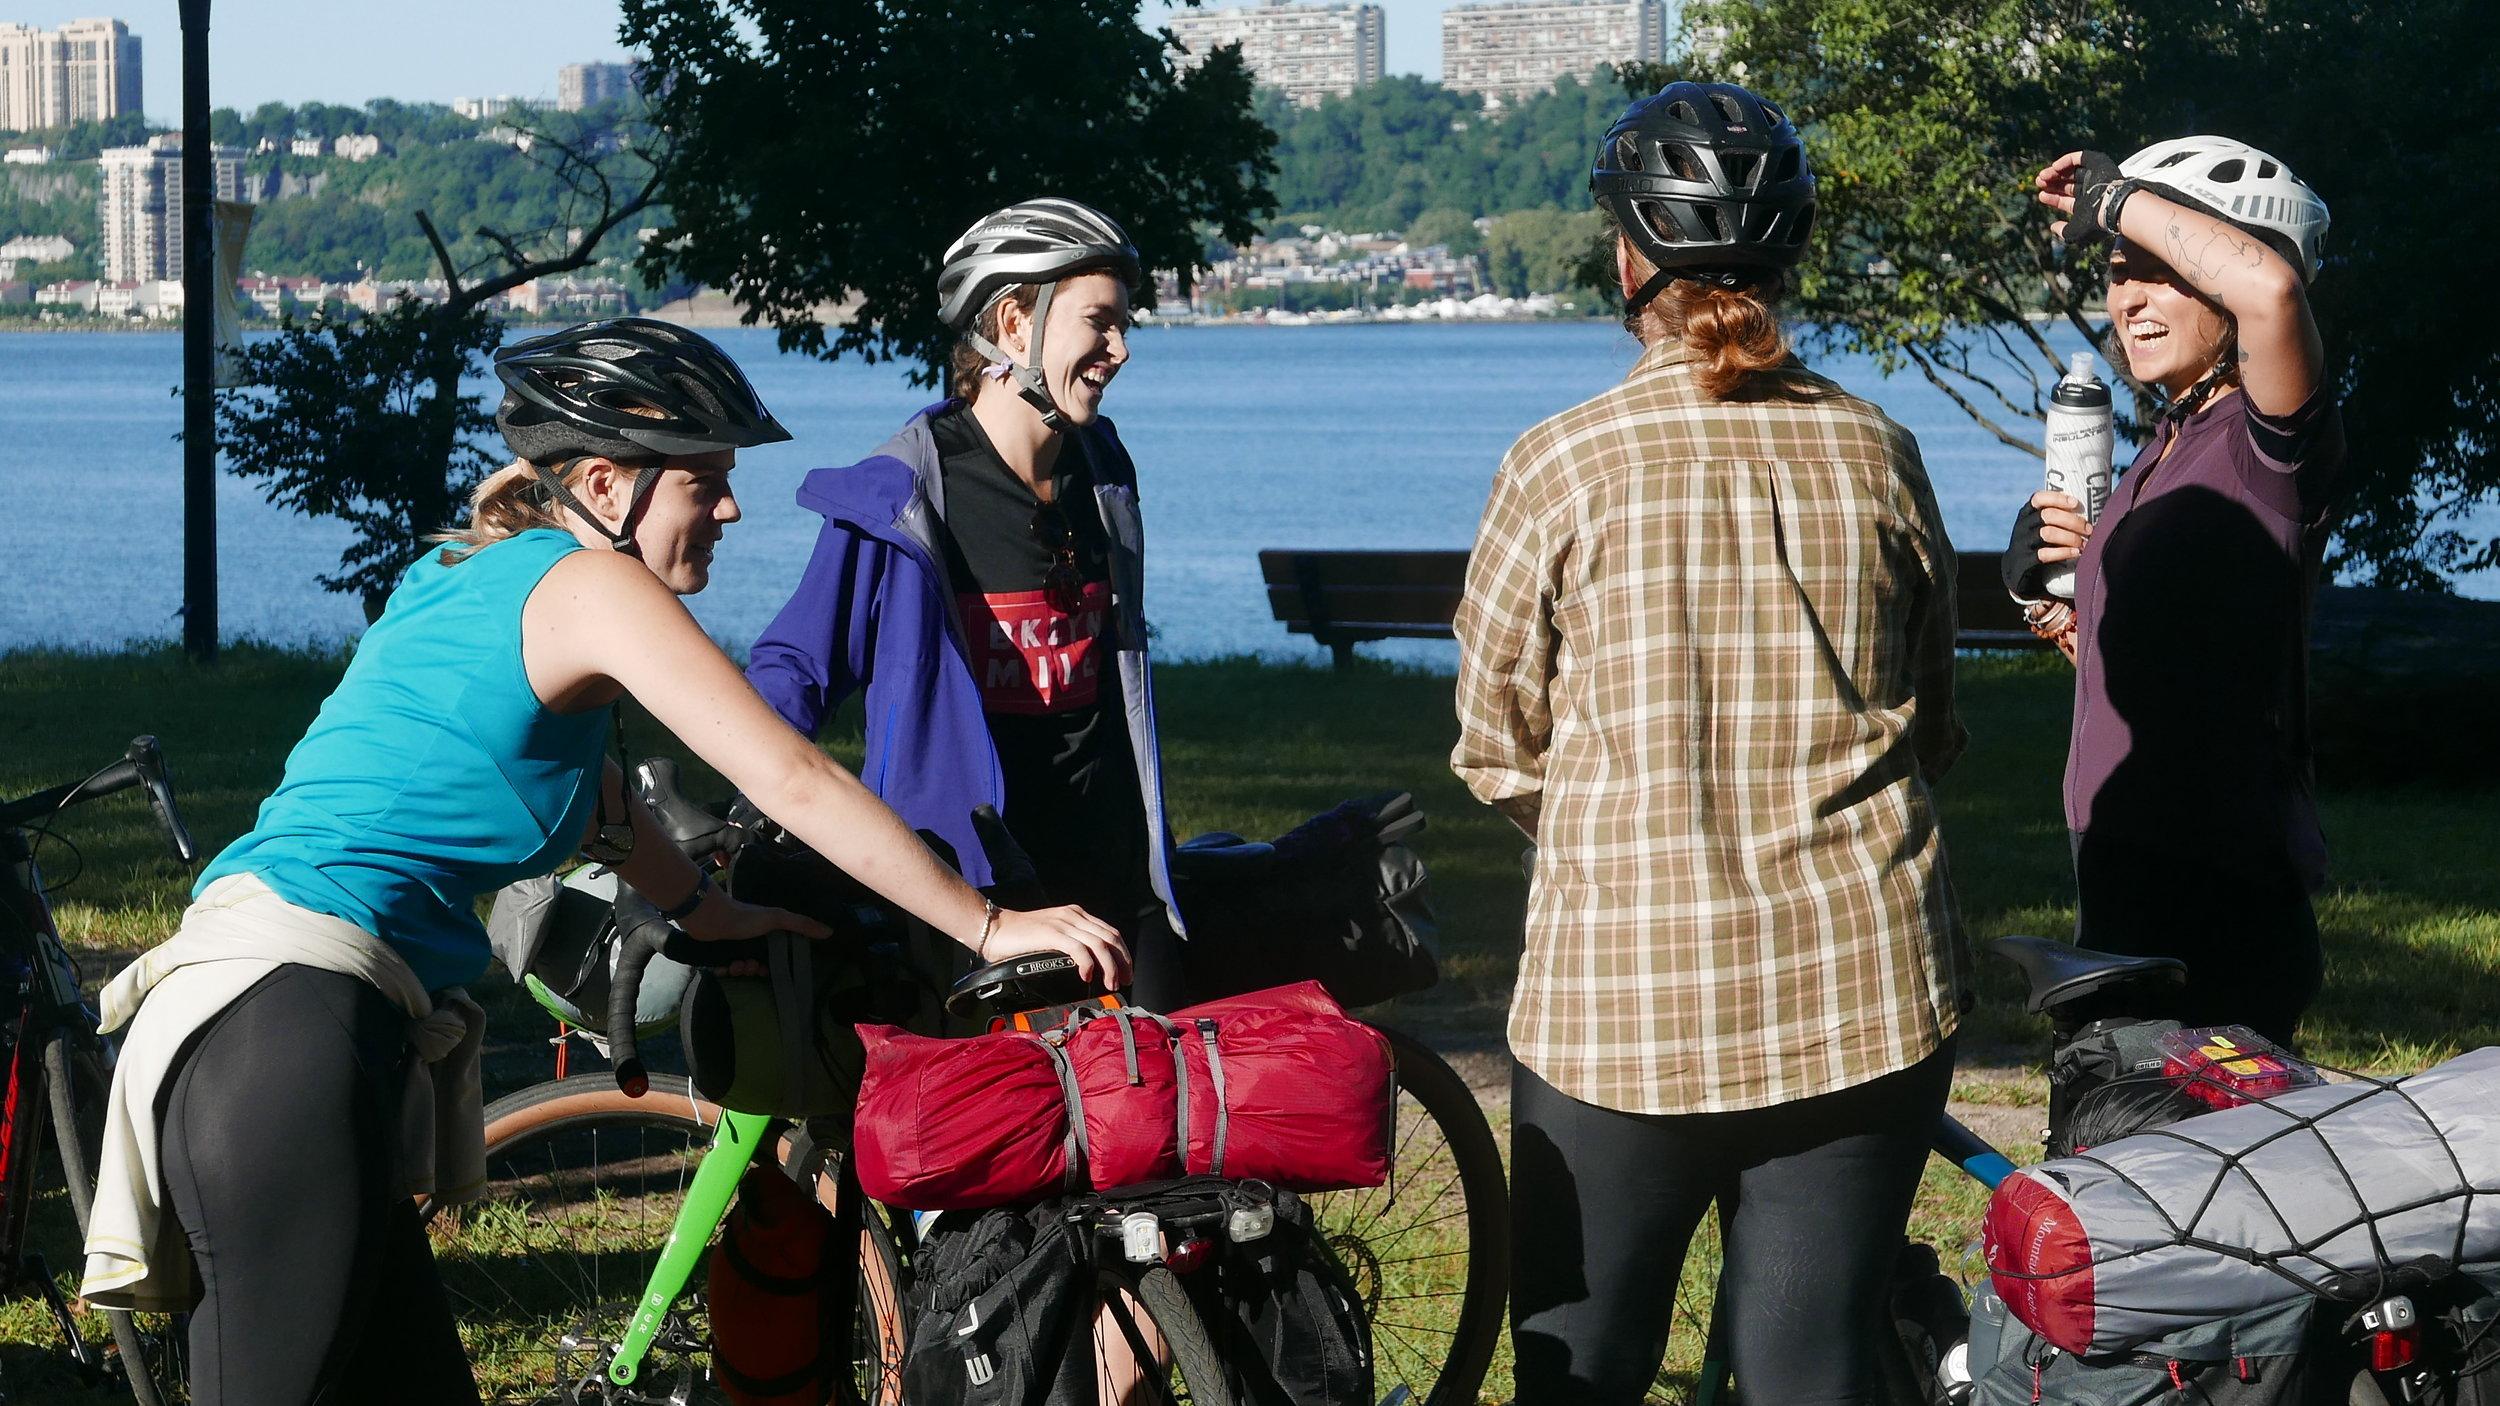 Pit stop near the George Washington Bridge on the Hudson River Greenway